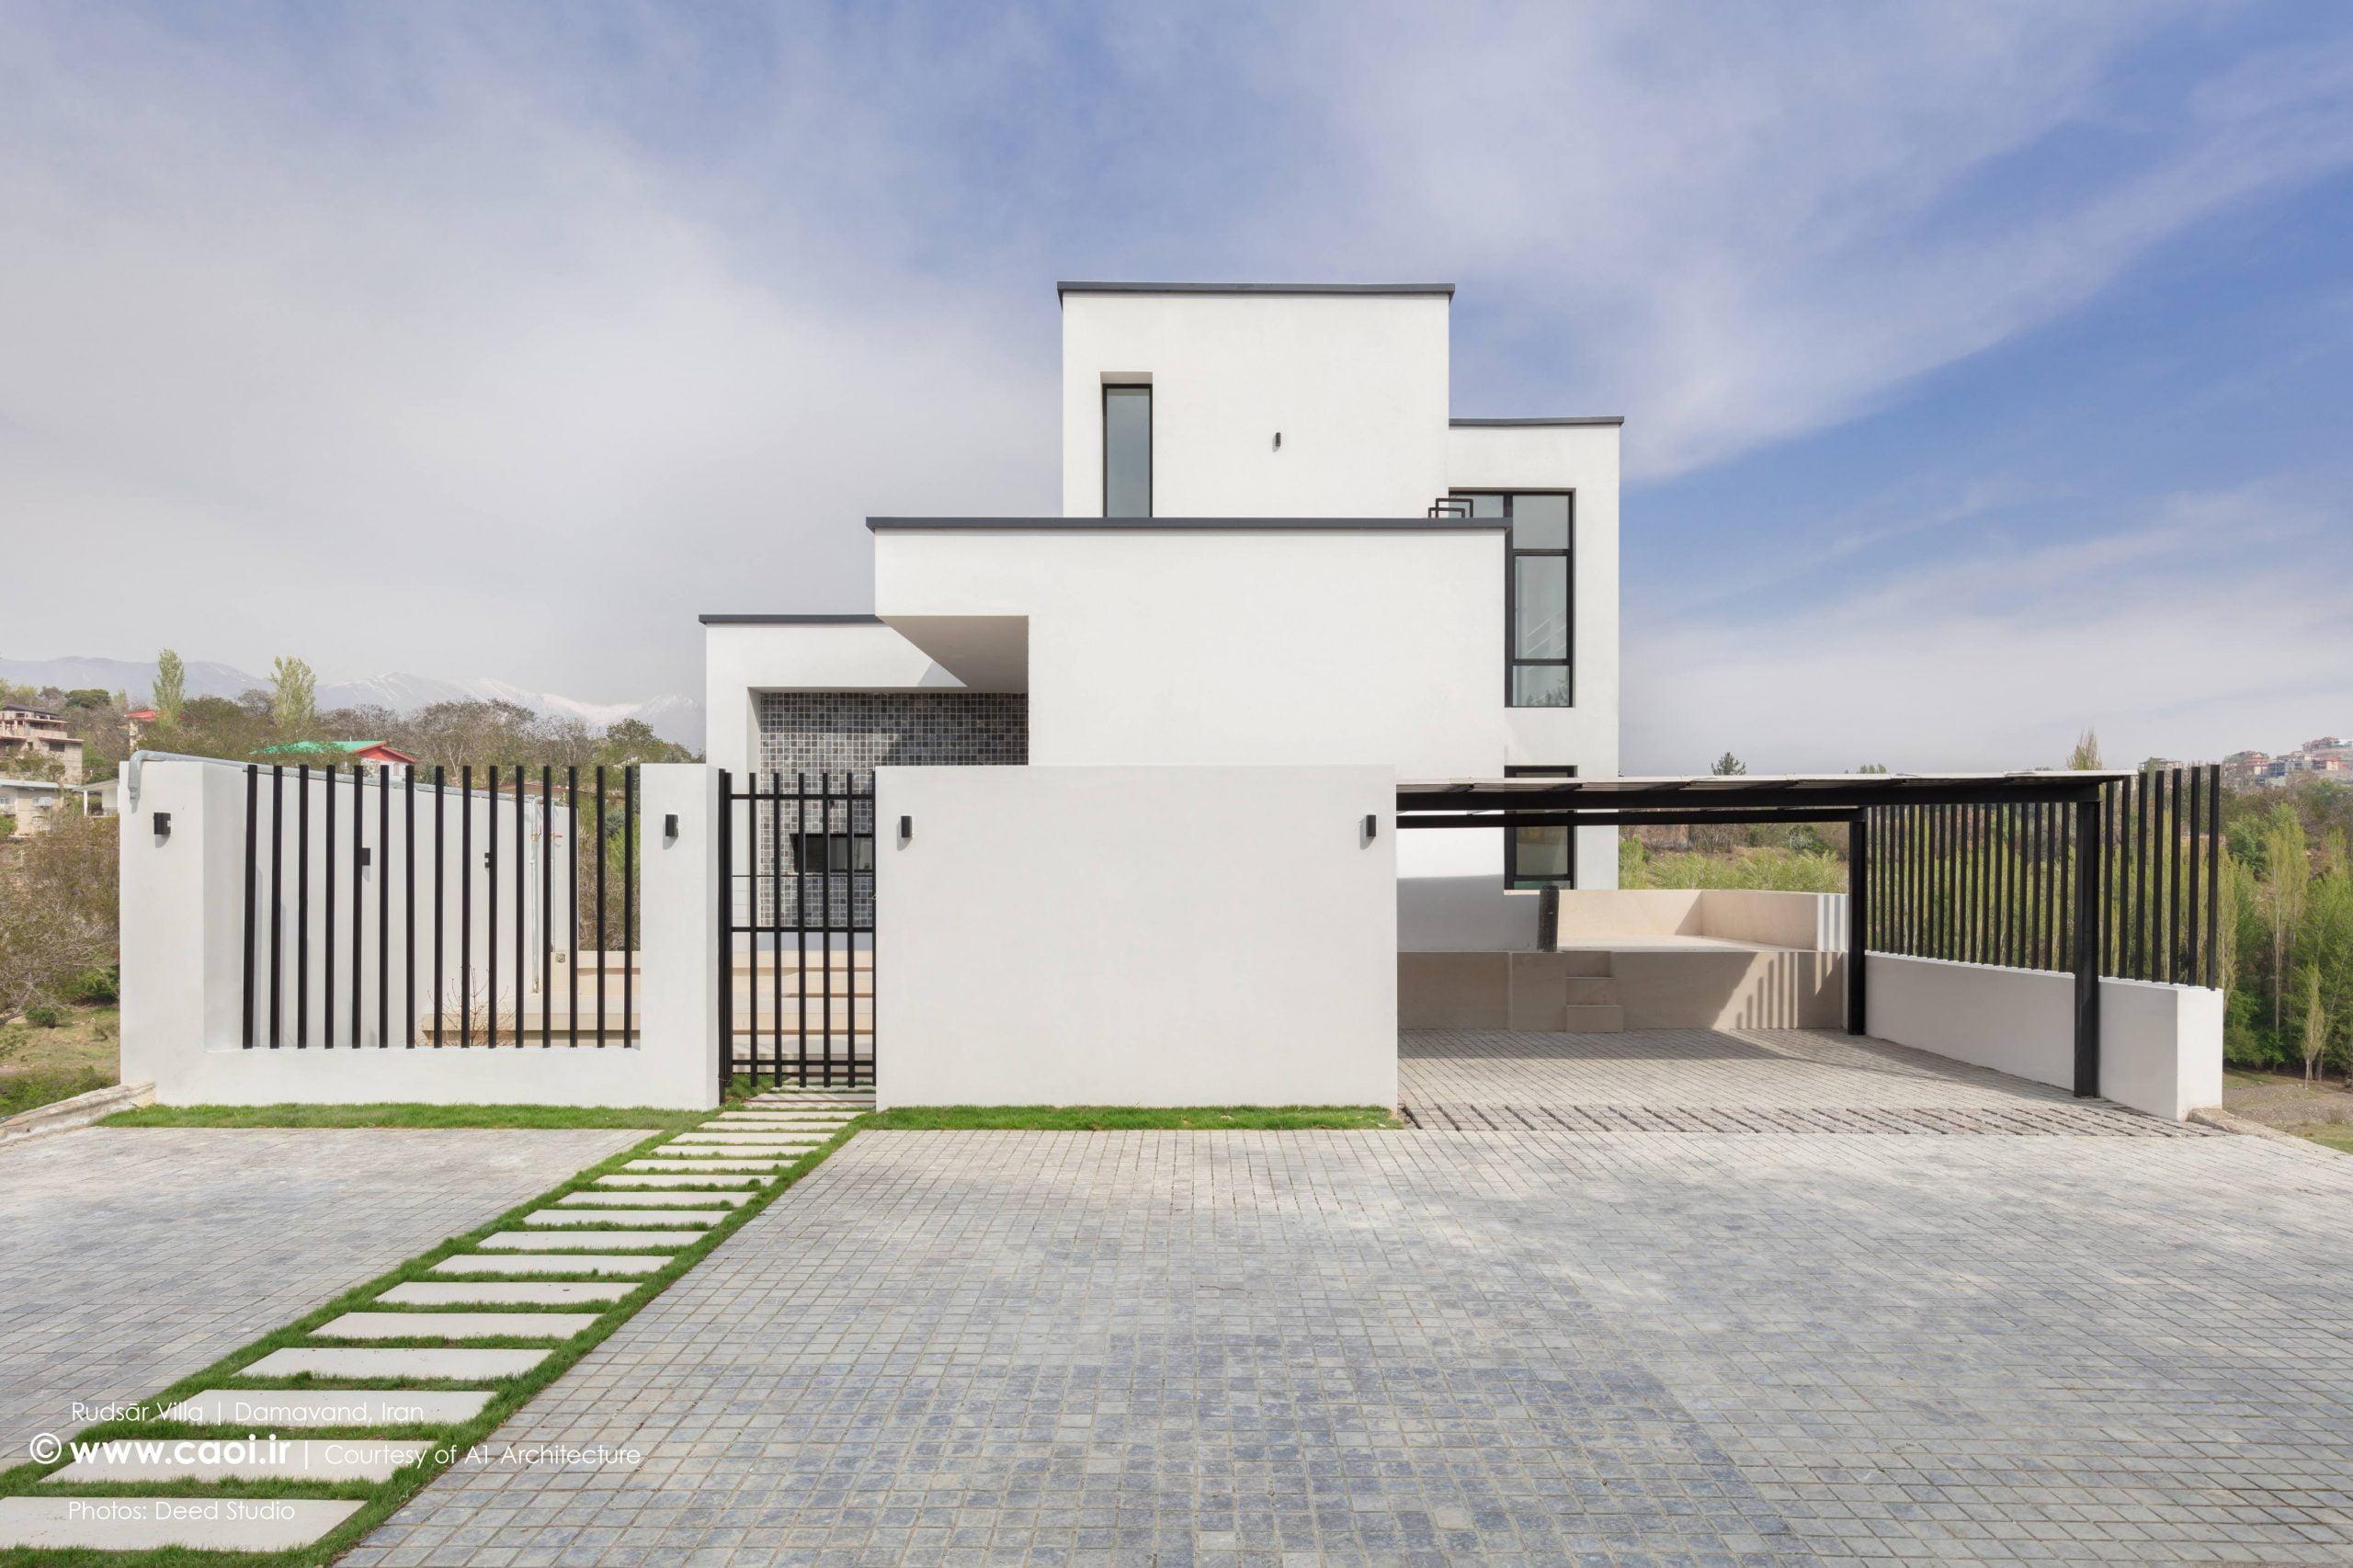 Rudsar_Villa_in_Iran_by_A1_Architecture_Modern_Villa__4_